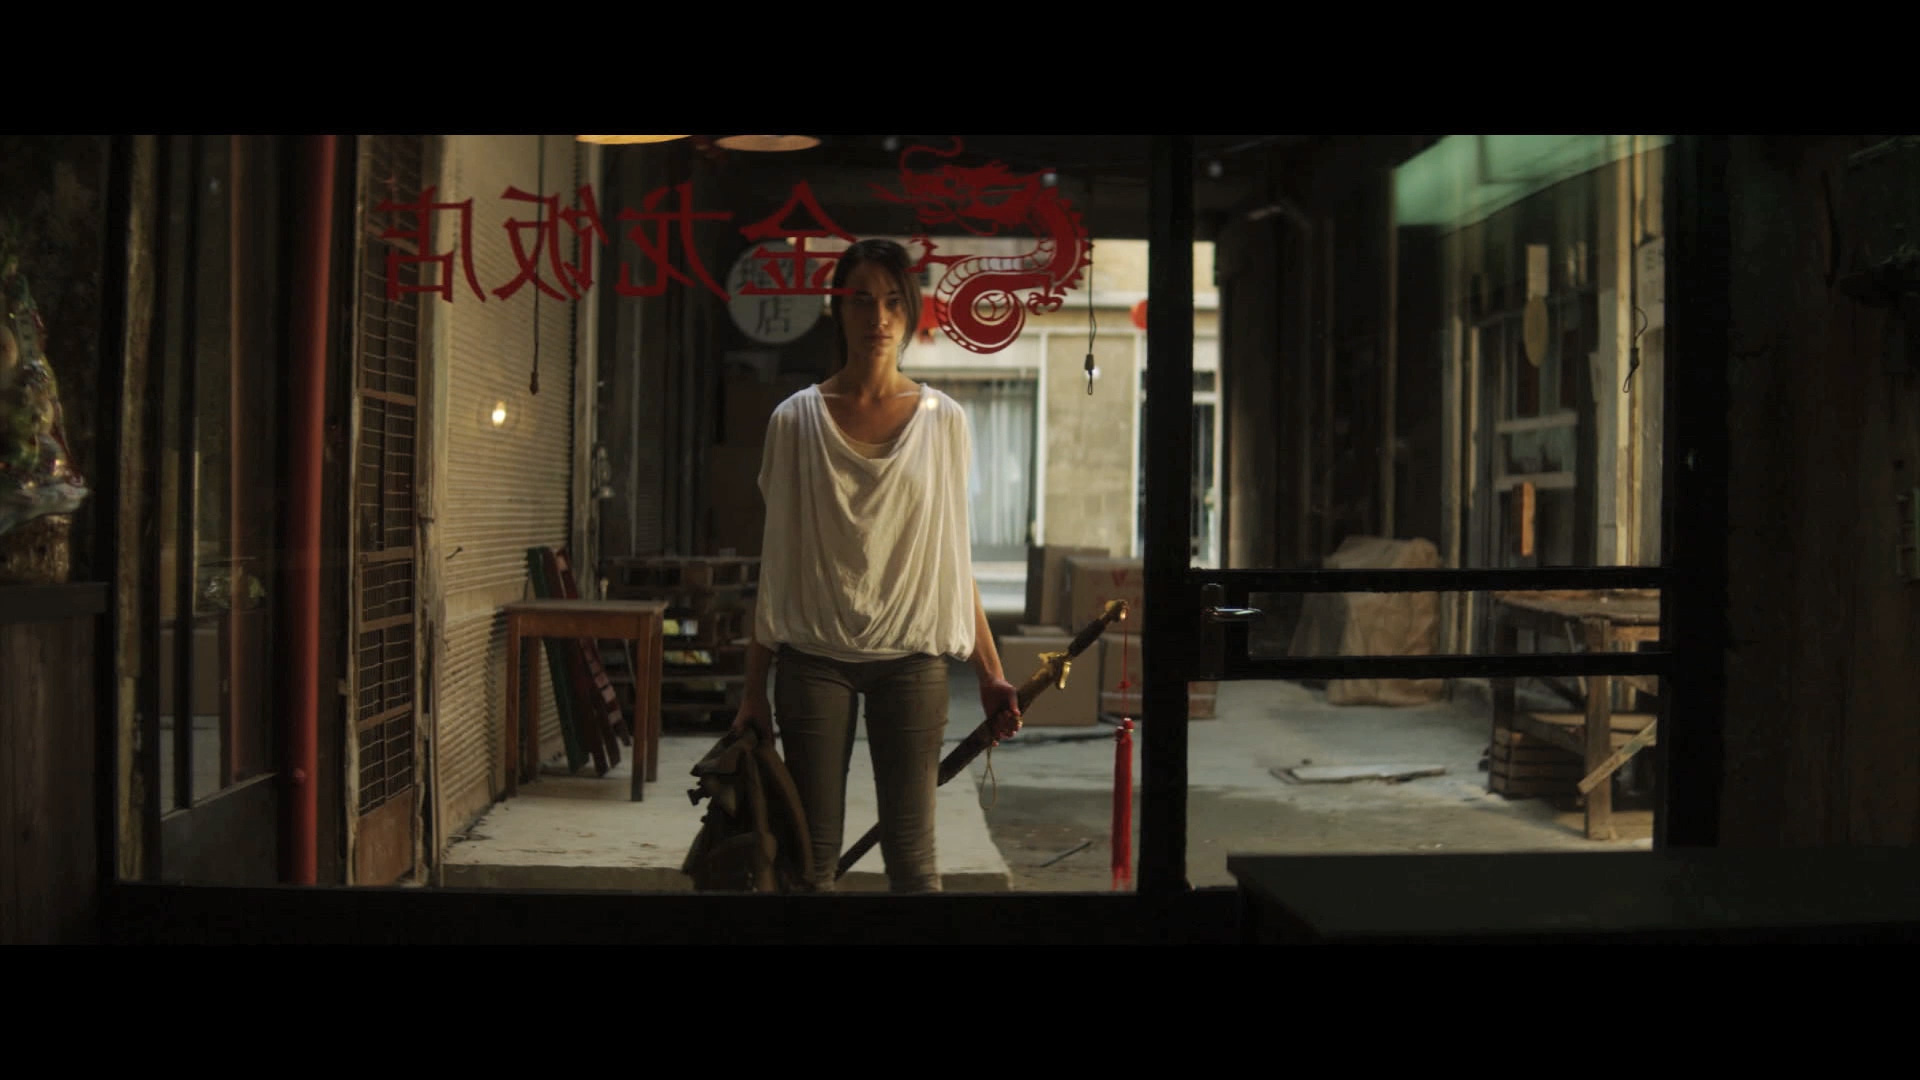 Chinatown - Τα τρία καταφύγια